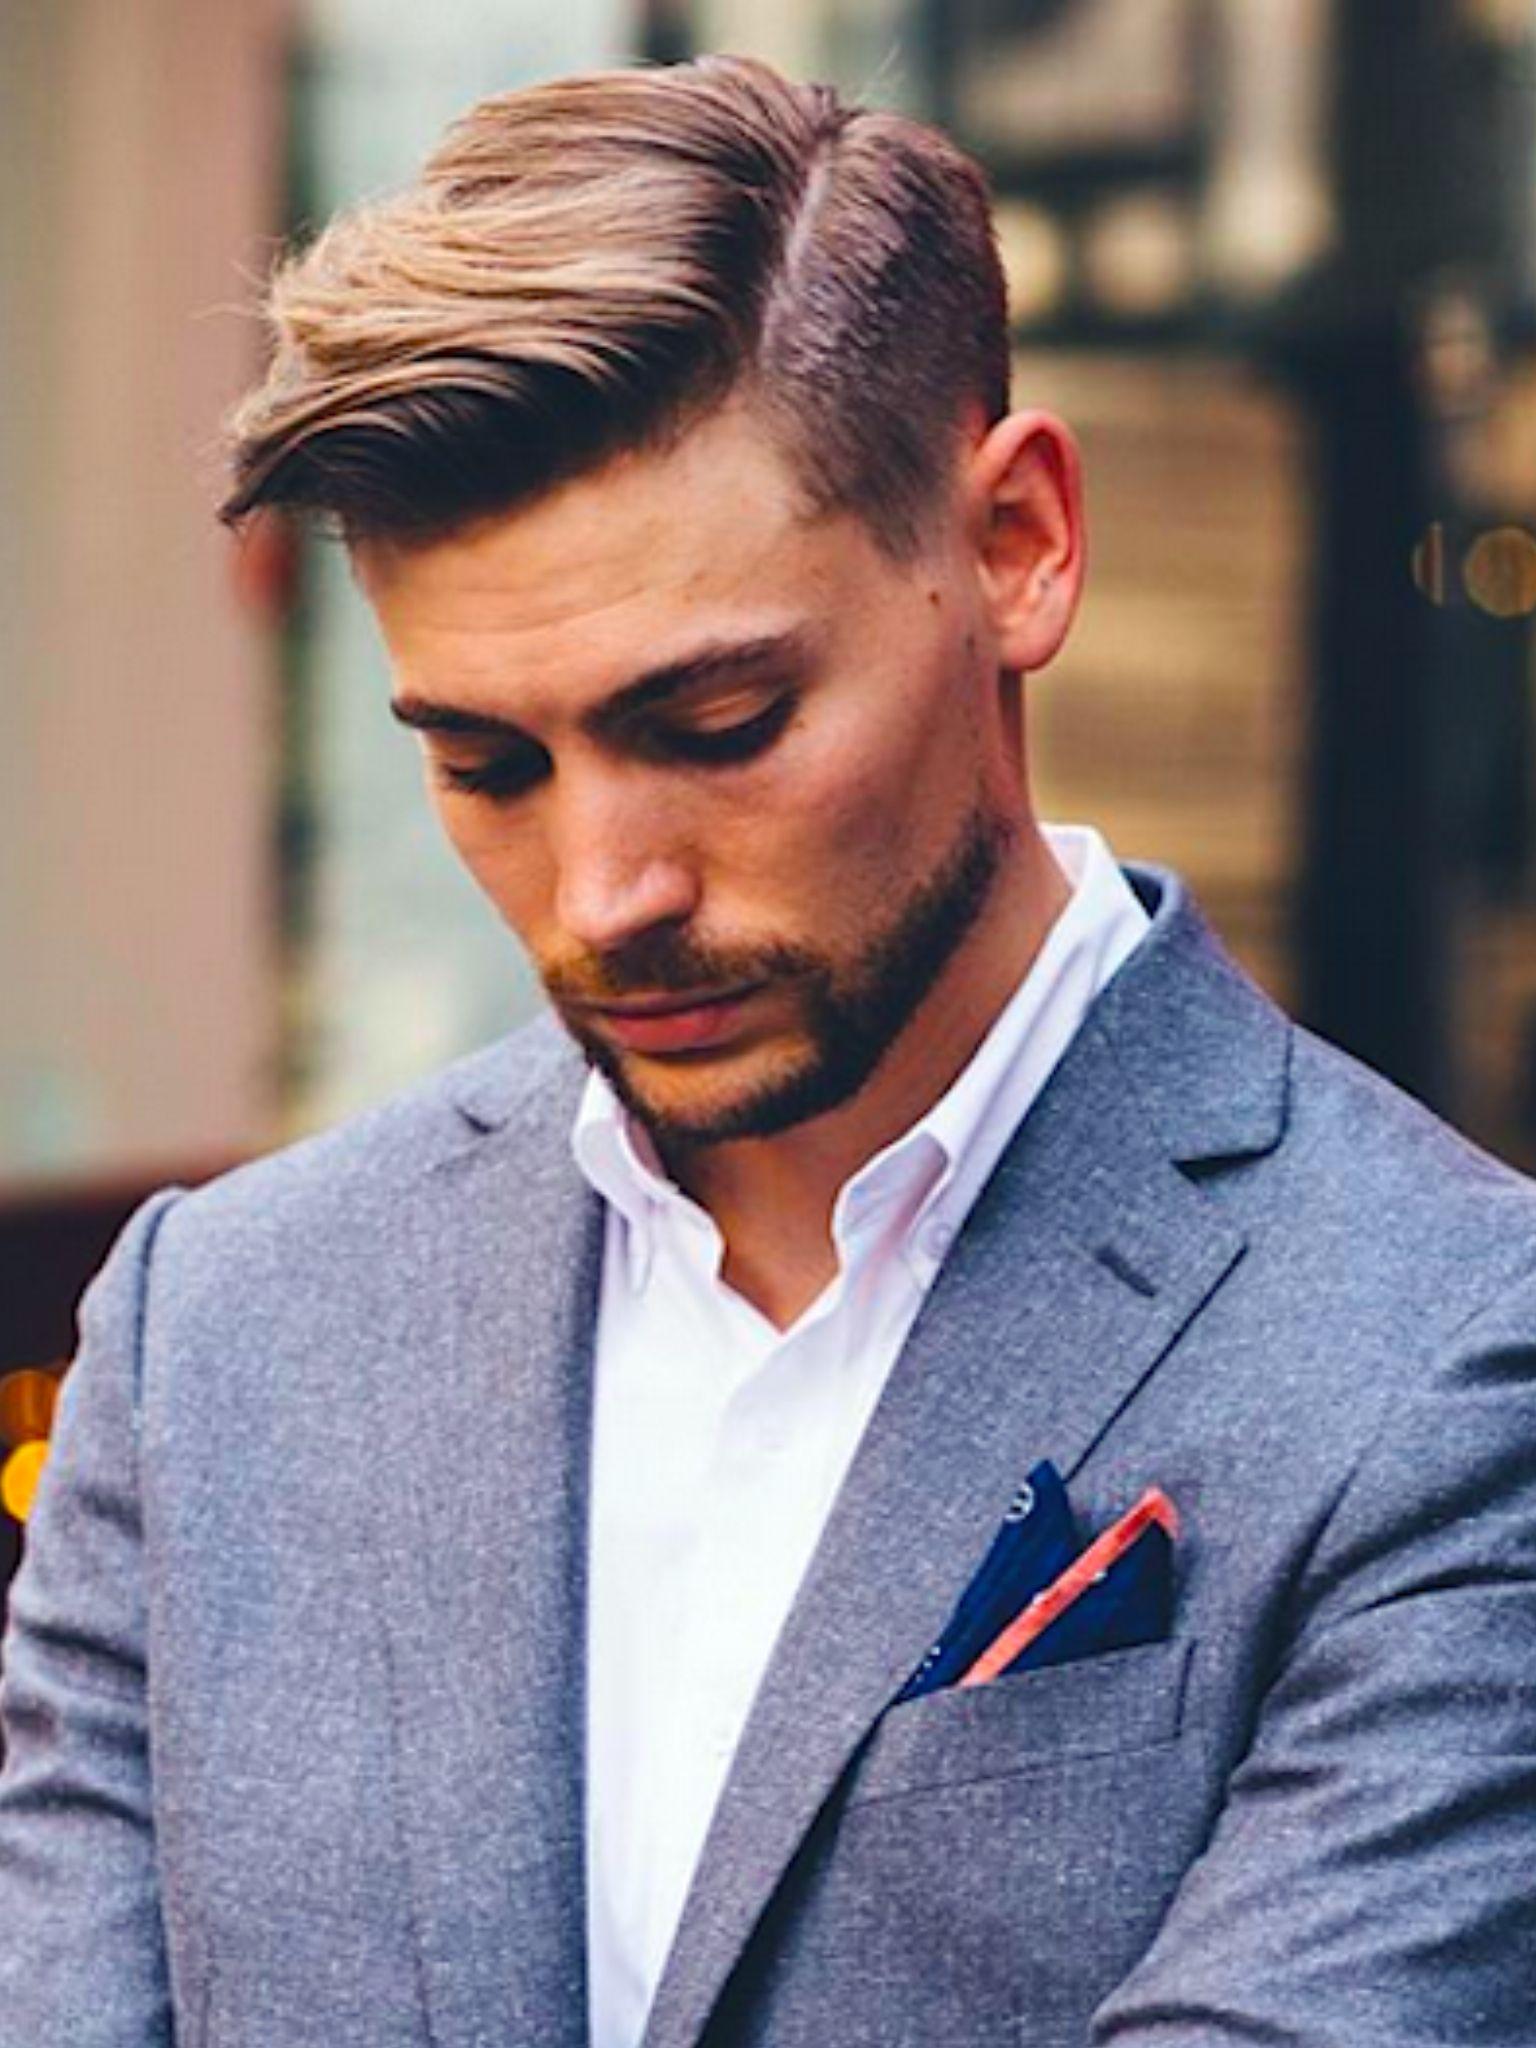 fashion #mensfashion #menswear #mensstyle #streetstyle #style #outfit #  mode homme # grooming # hair   Herrehår, Skægstil, Mandemode